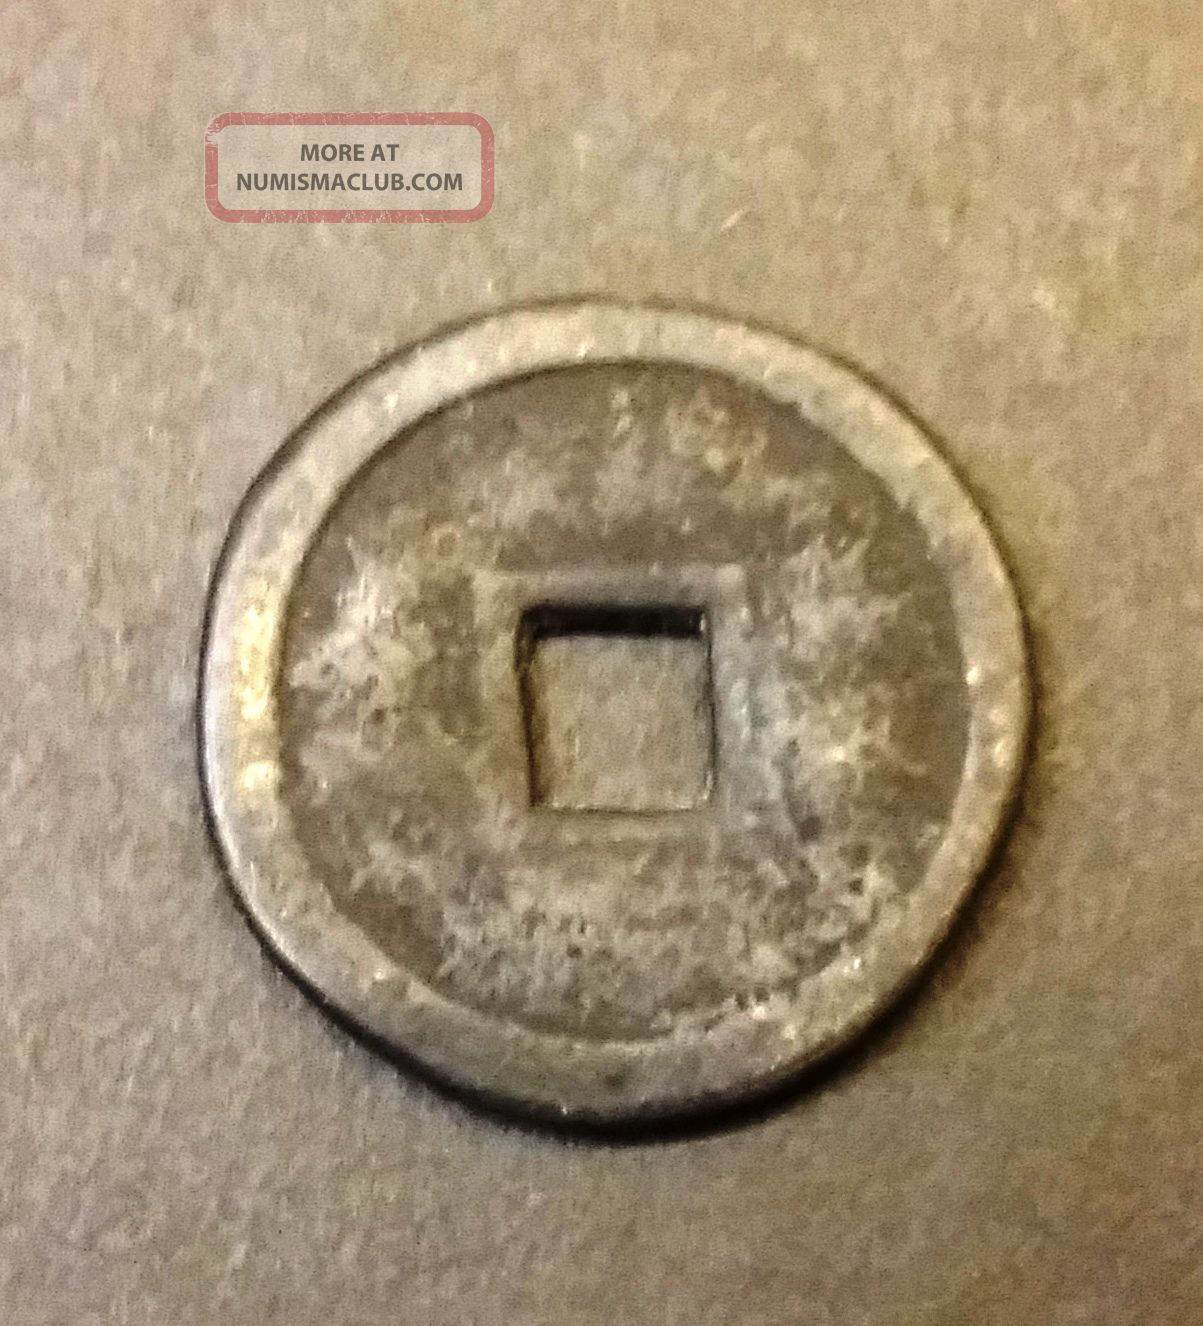 1994 China Lunar Zodiac Year Of The Dog Coin Medal Fine: China Empire Yuan Dynasty Zhizheng 1341